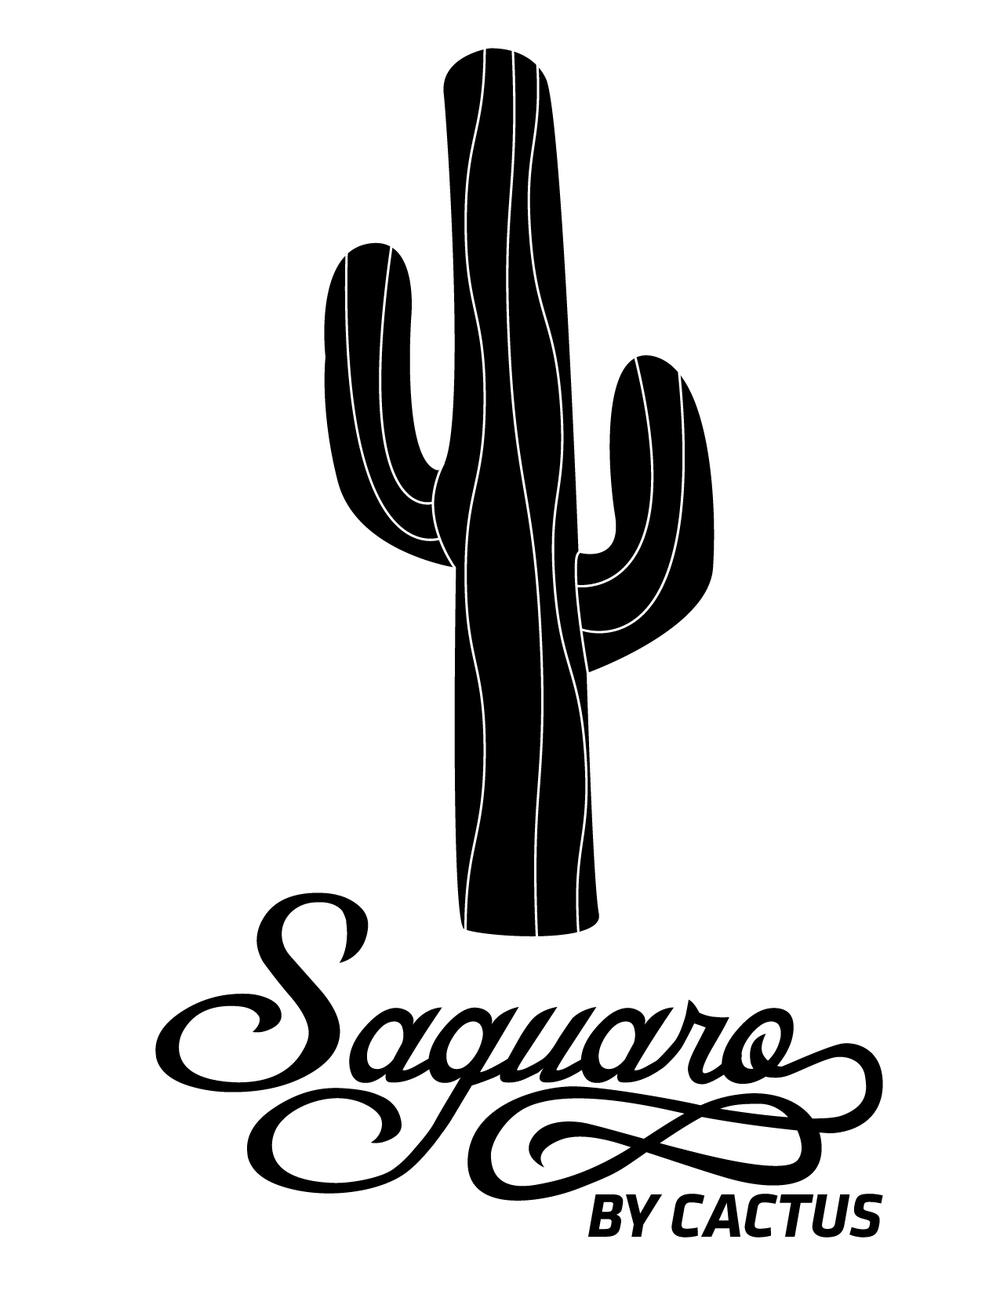 Saguaro by Cactus-01.jpg